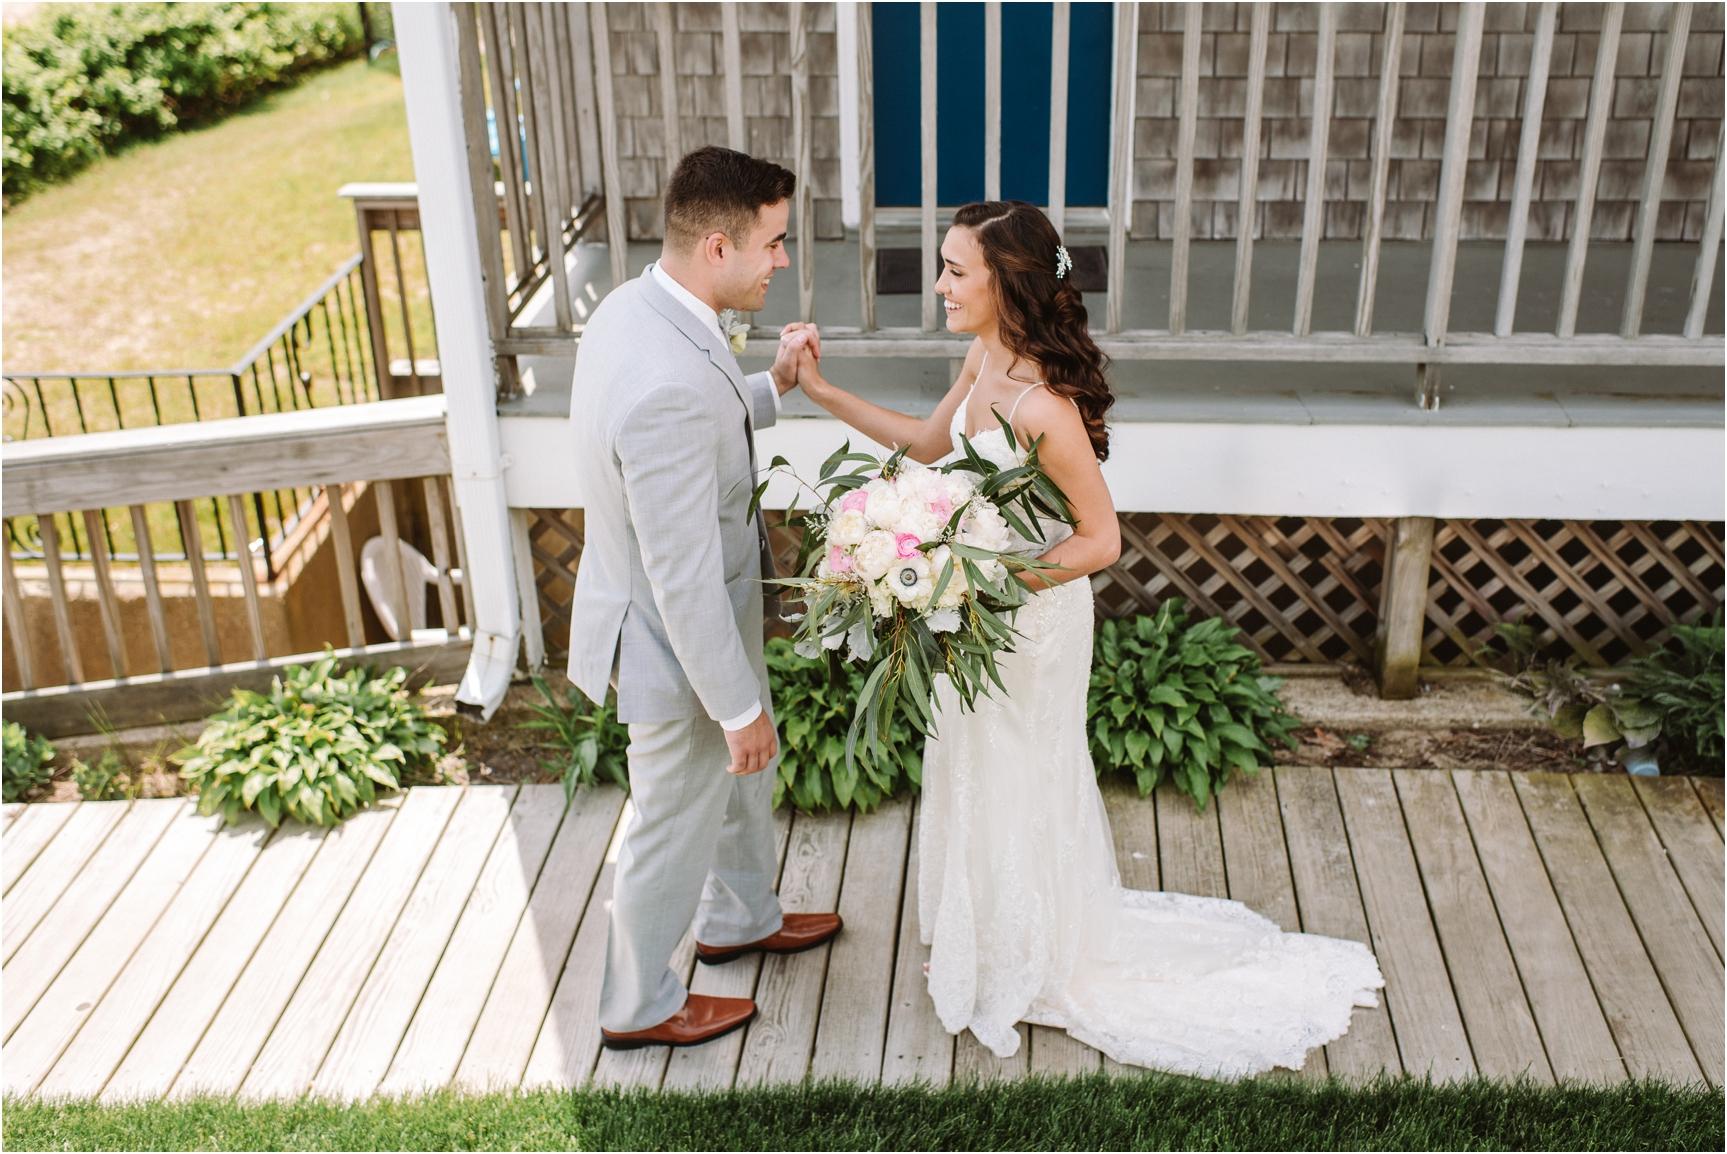 Sarah & Sam Pelham House Cape Cod Wedding Photographer-43.jpg